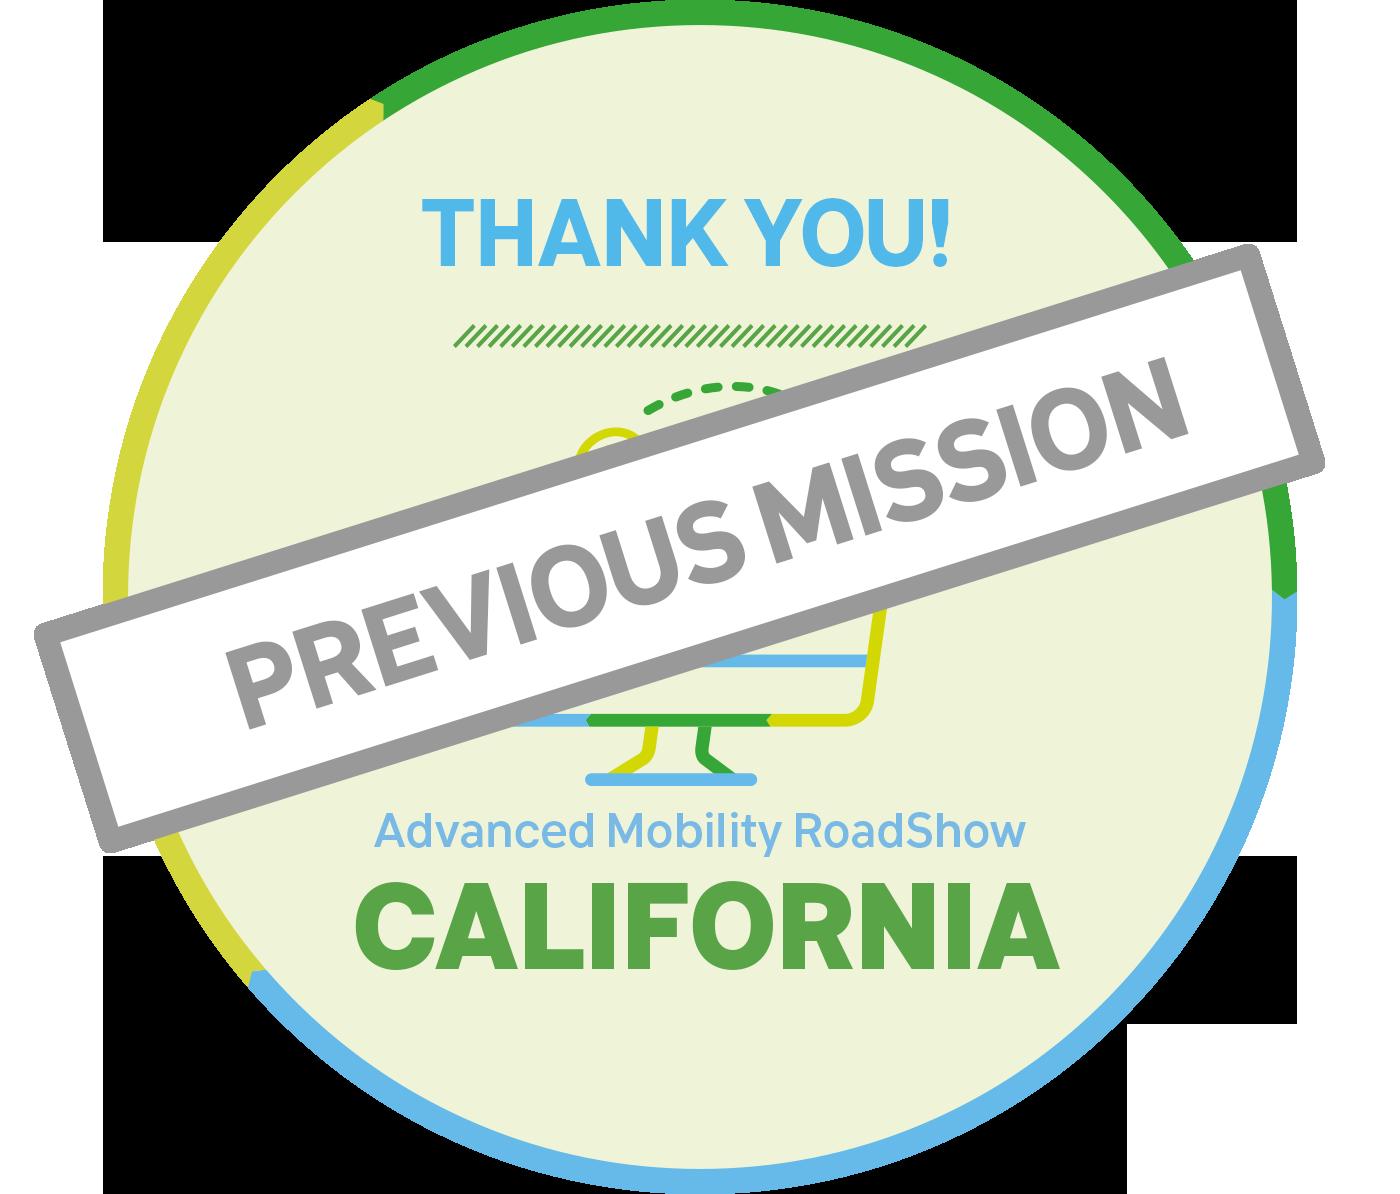 PREVIOUS MISSION : Advanced Mobility RoadShow in California